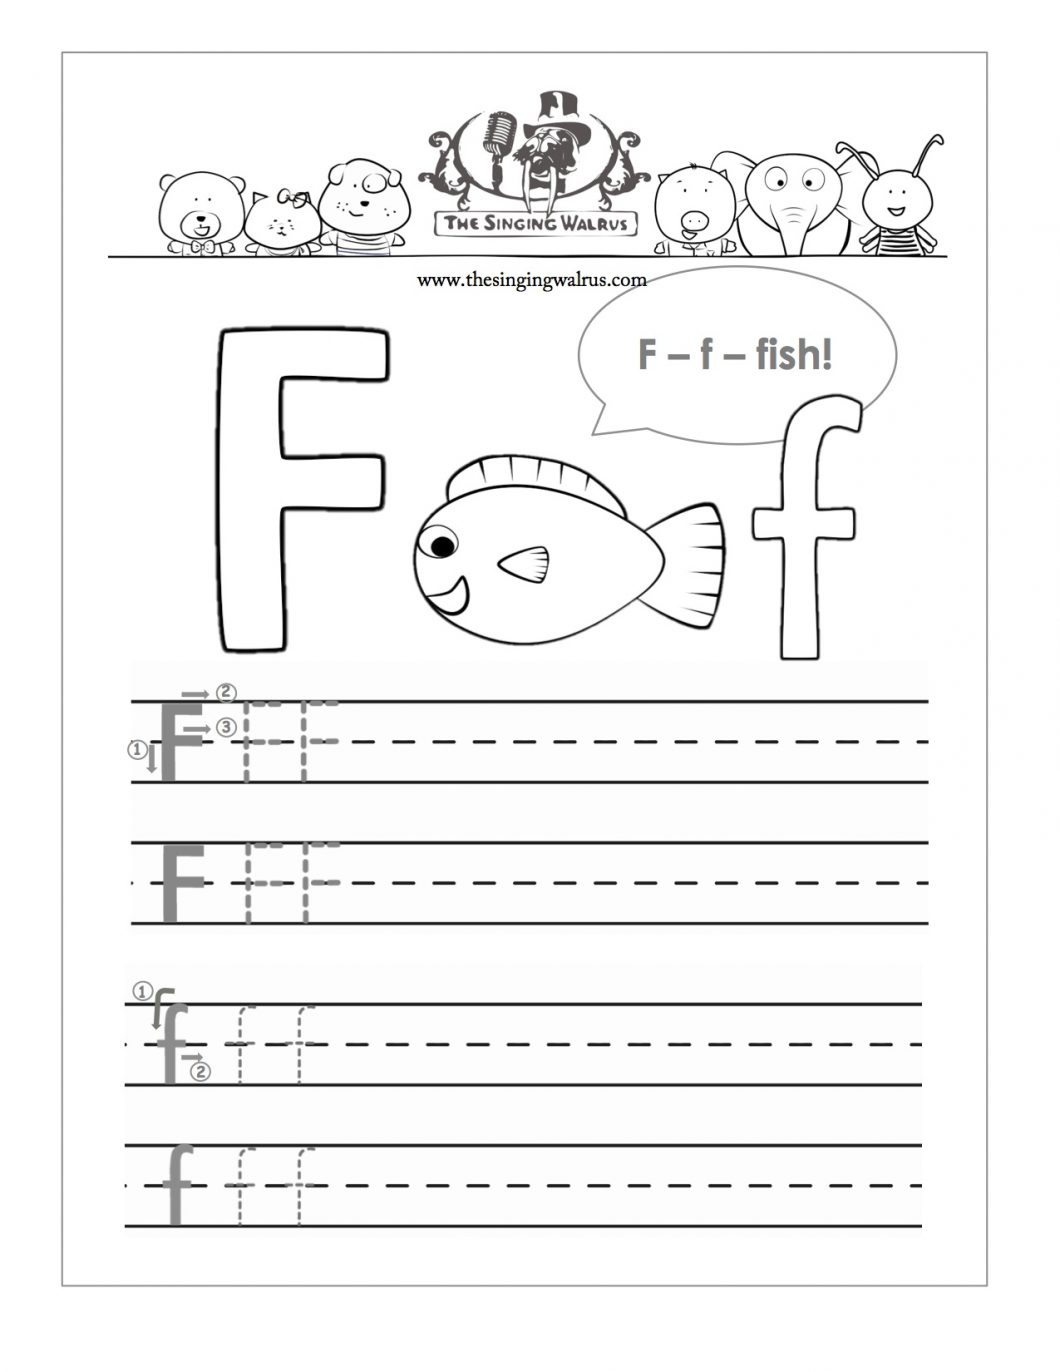 Kindergarten Letter Worksheets – With Free 4Th Grade Math Also Abc - Free Printable Alphabet Worksheets For Kindergarten